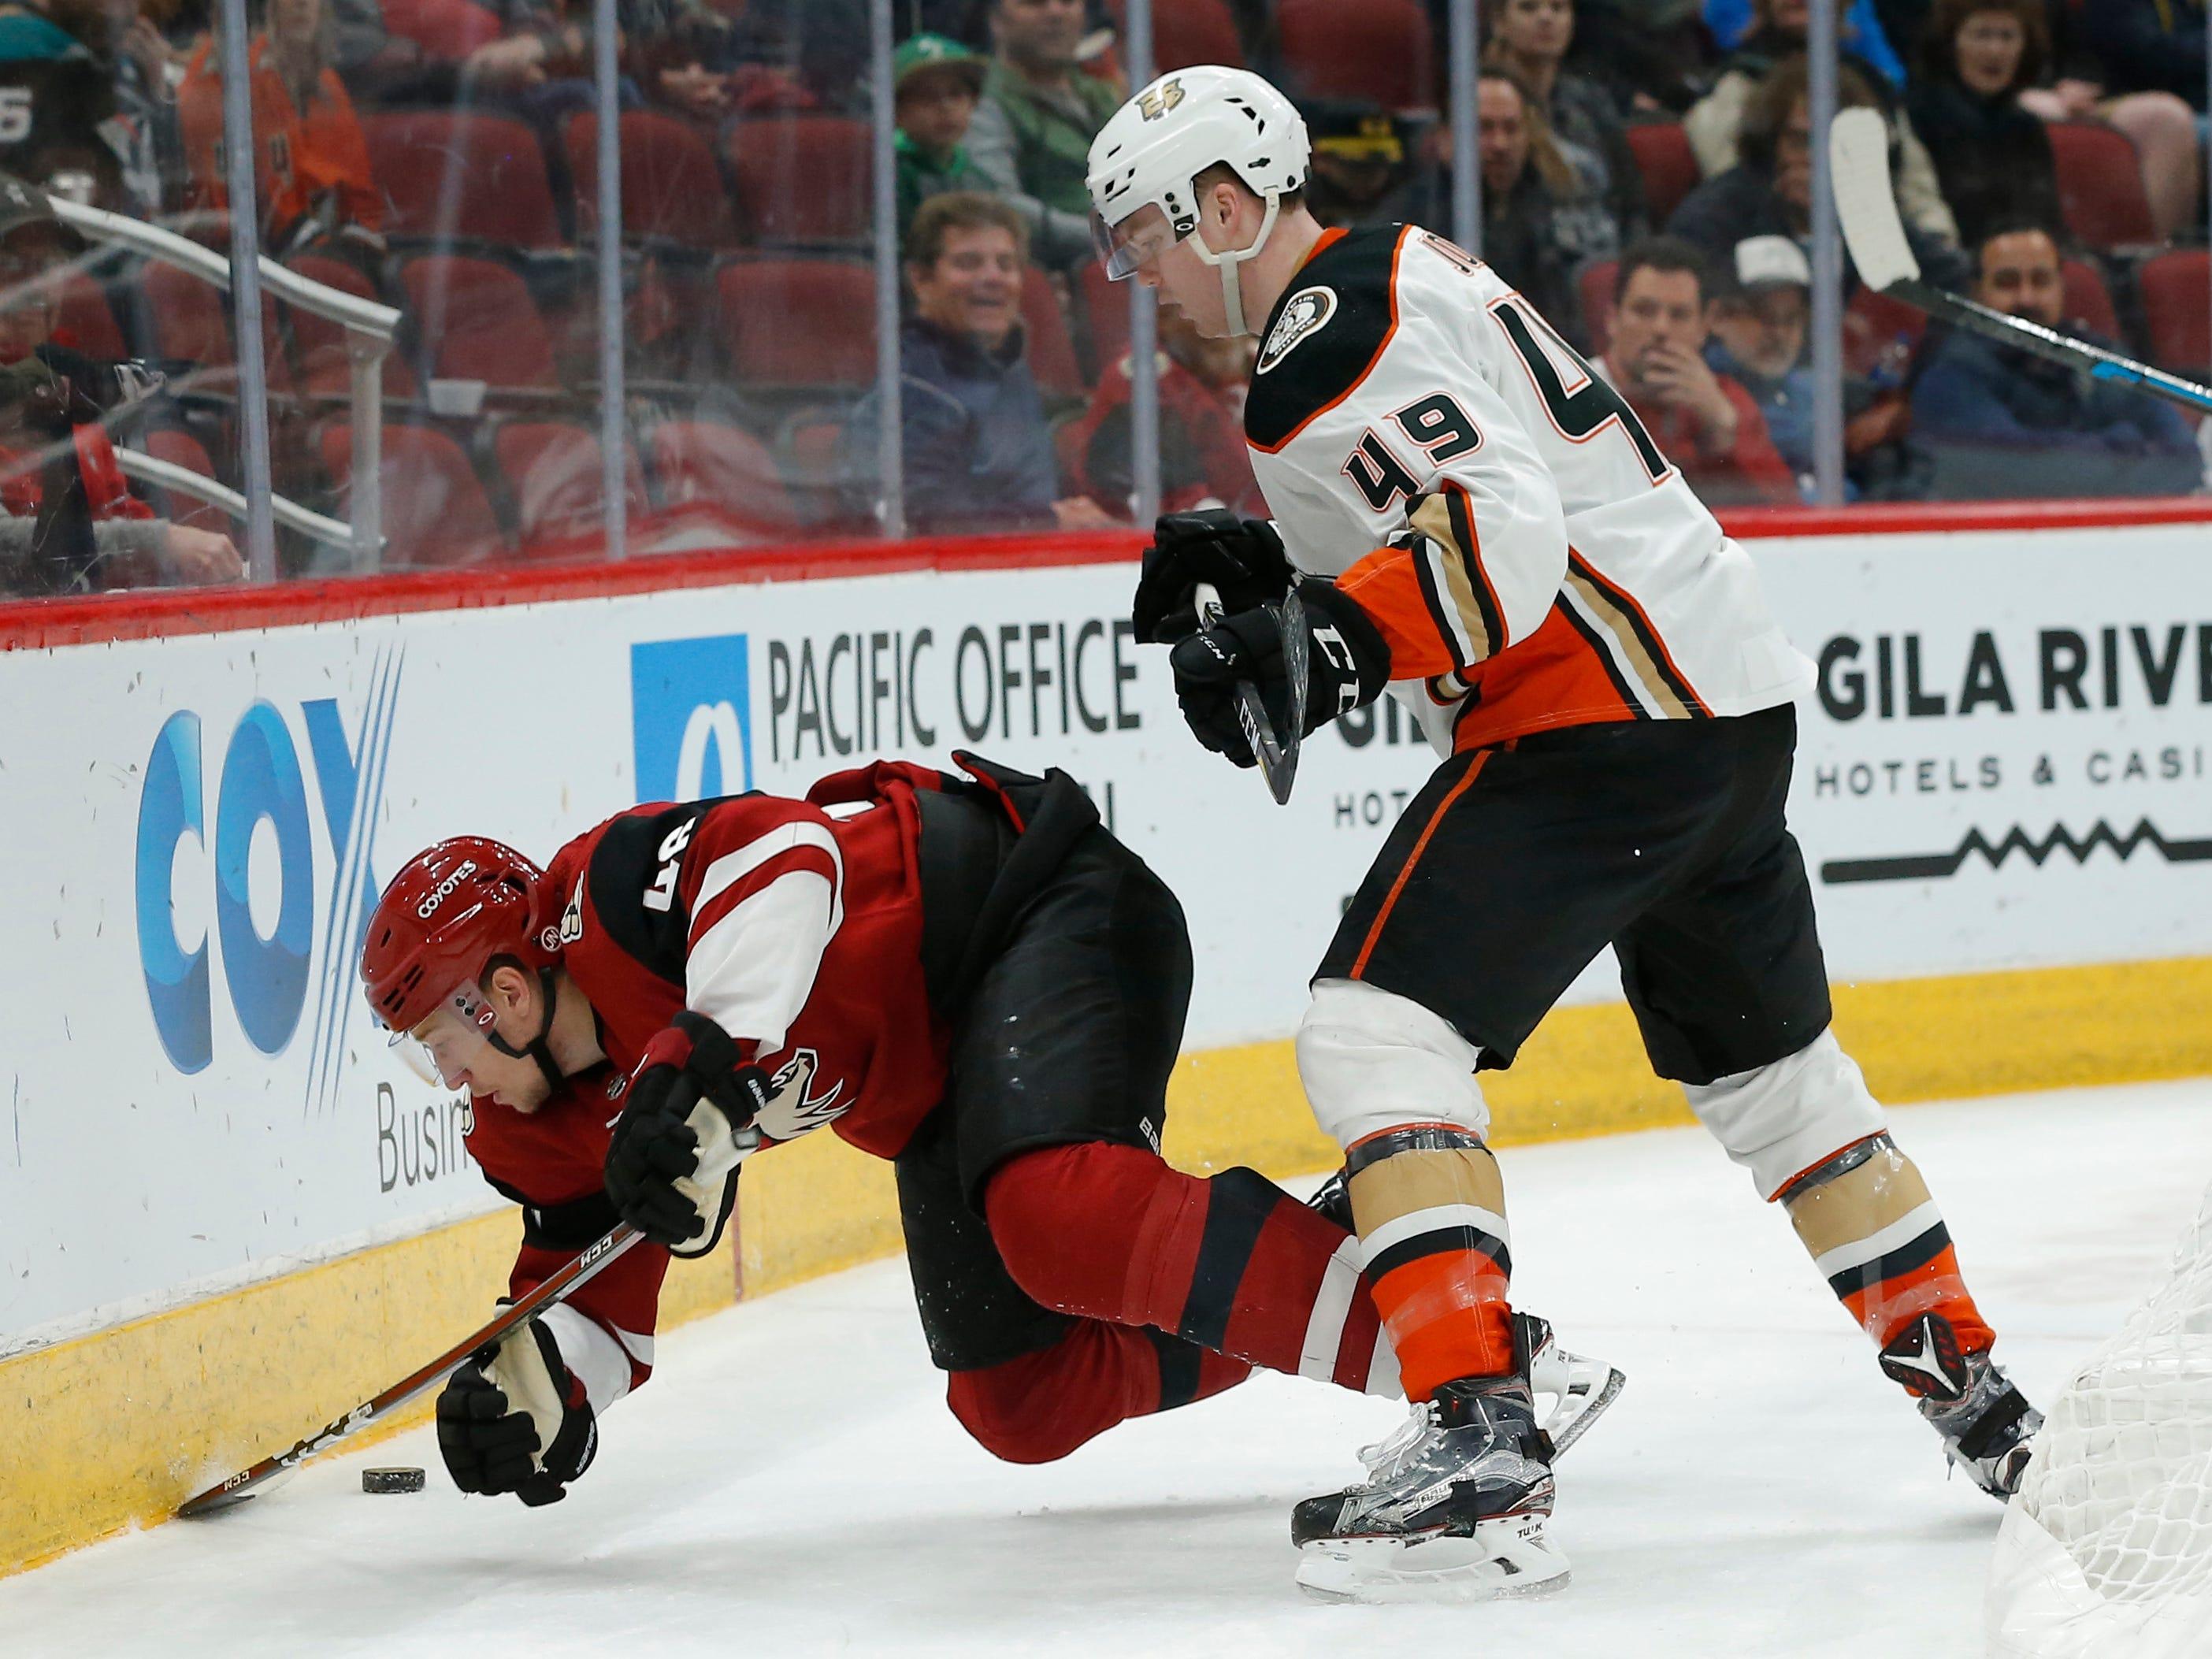 Anaheim Ducks left wing Max Jones (49) checks Arizona Coyotes defenseman Ilya Lyubushkin to the ice in the first period during an NHL hockey game, Thursday, March 14, 2019, in Glendale, Ariz.